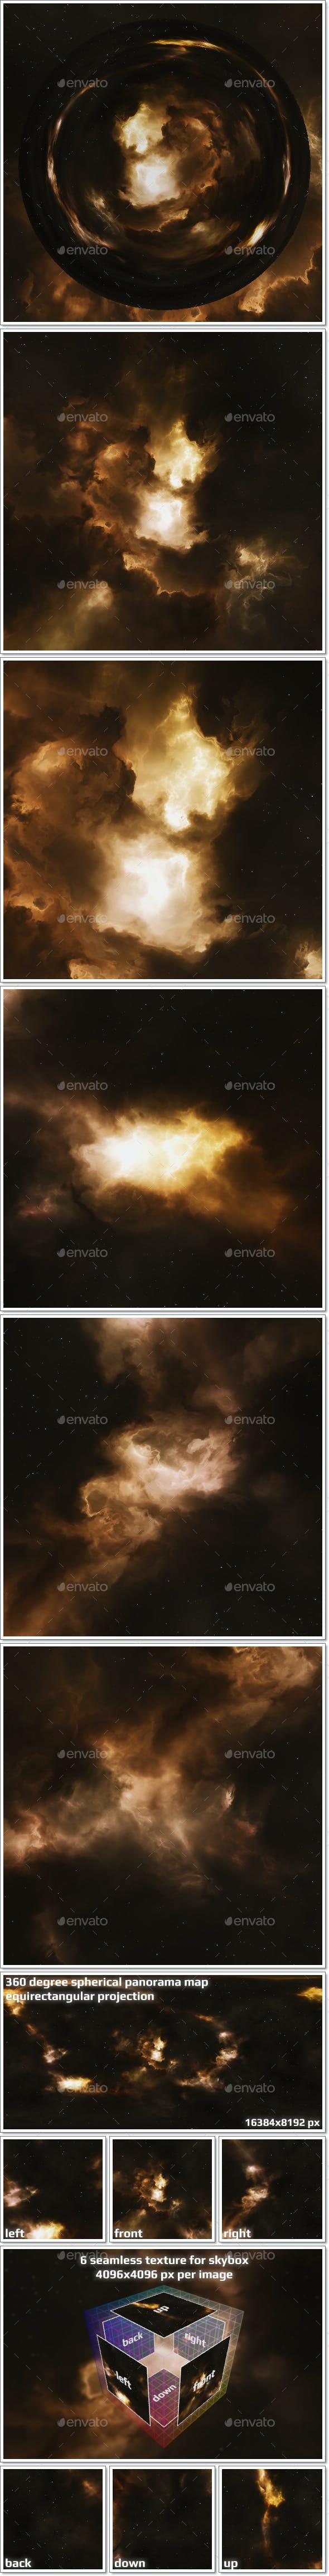 Nebula Space Environment HDRI Map 015 - 3DOcean Item for Sale